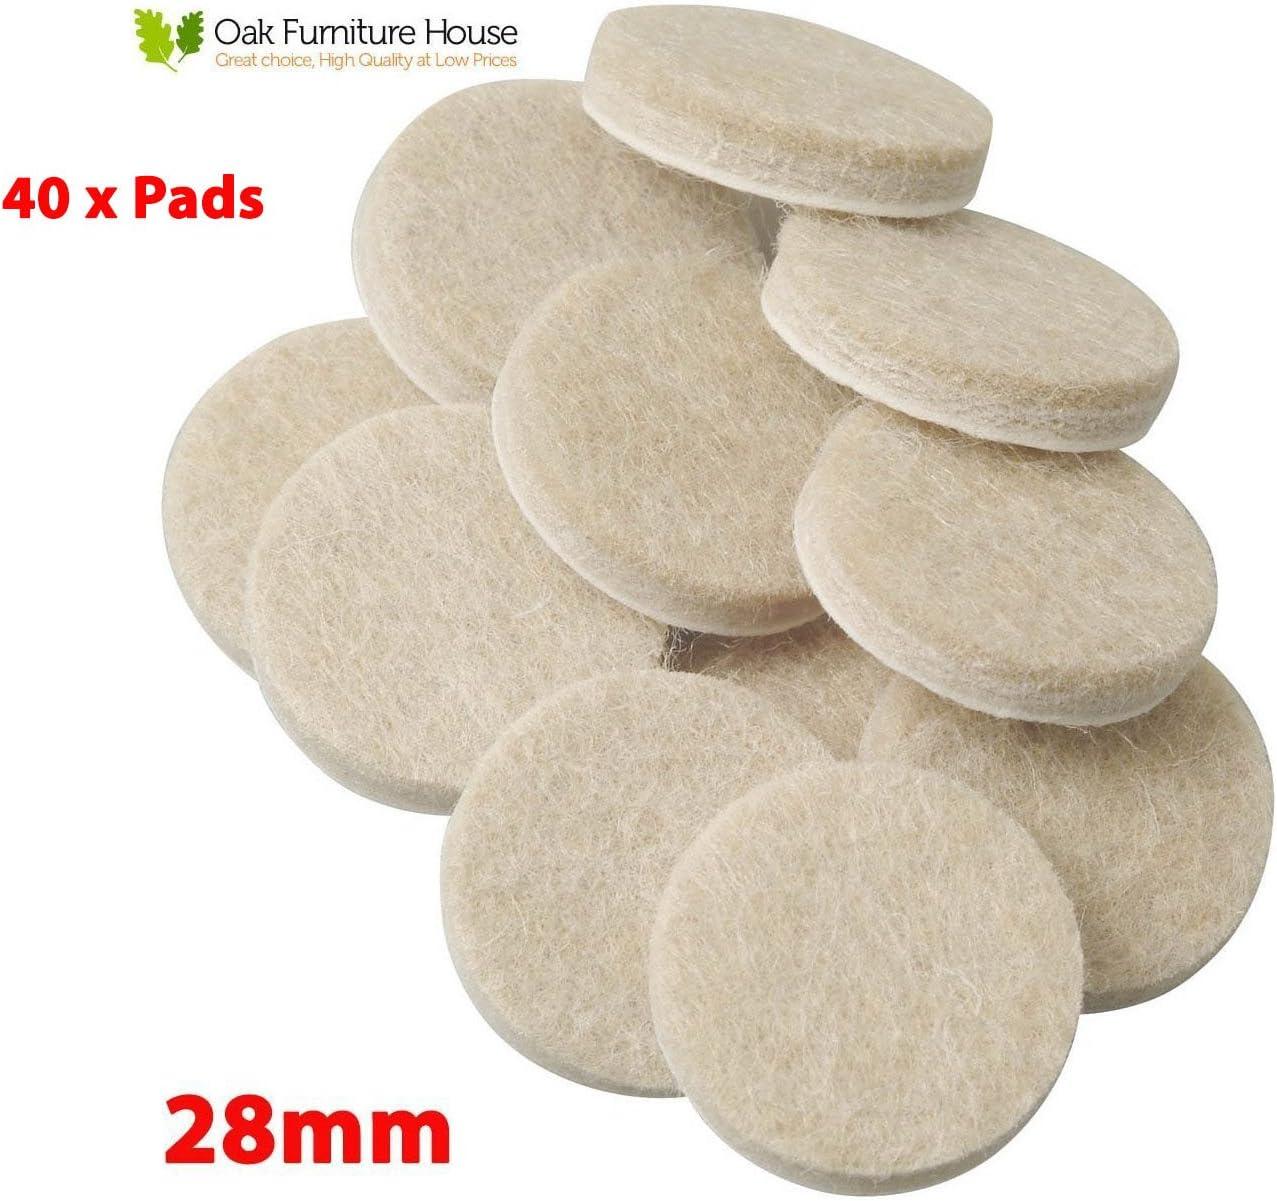 40 Oak Furniture Self Adhesive Felt Pads Wood Floor Protectors 28mm